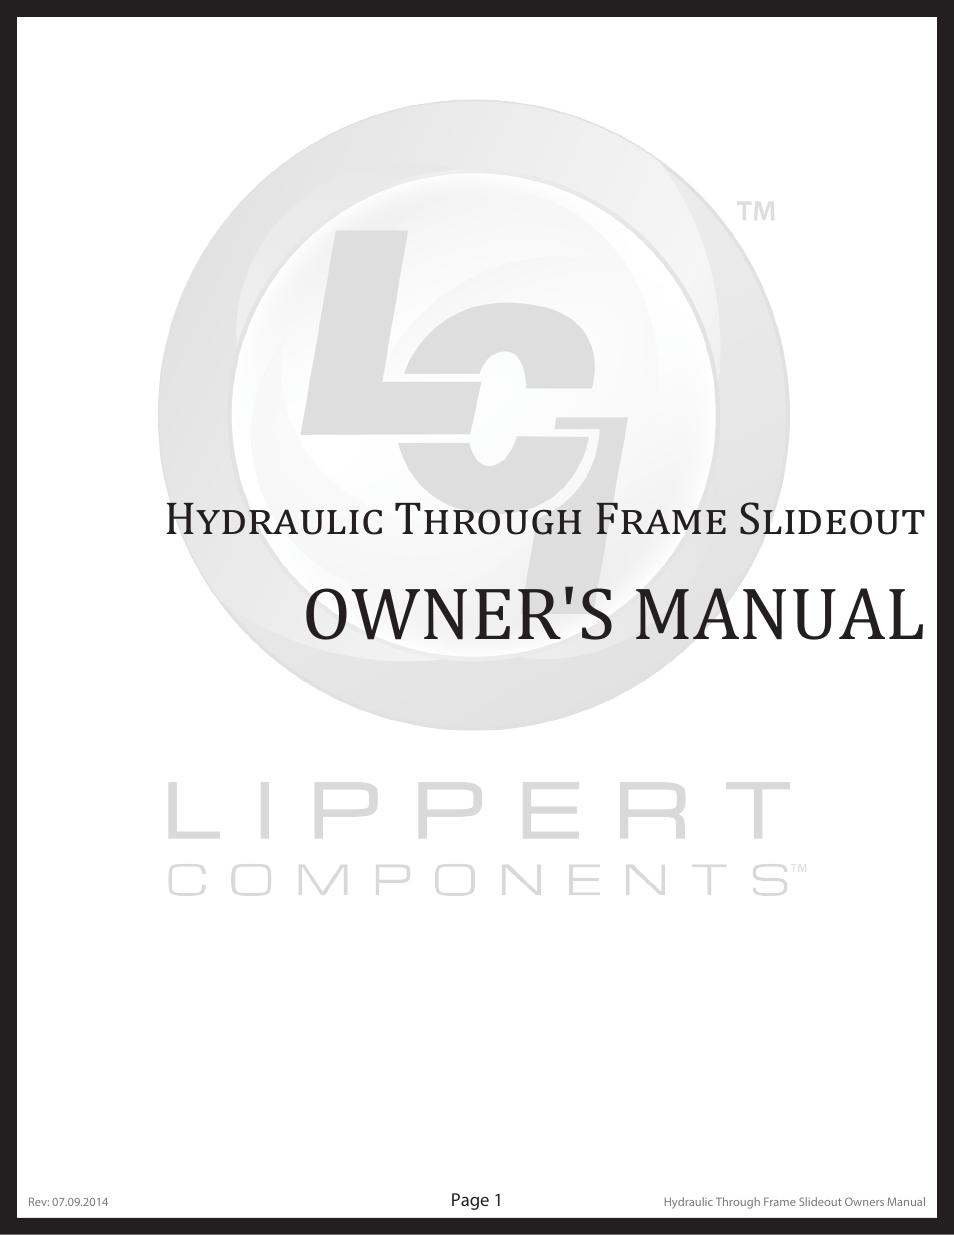 Lippert Components Hydraulic Through Frame Slideout User